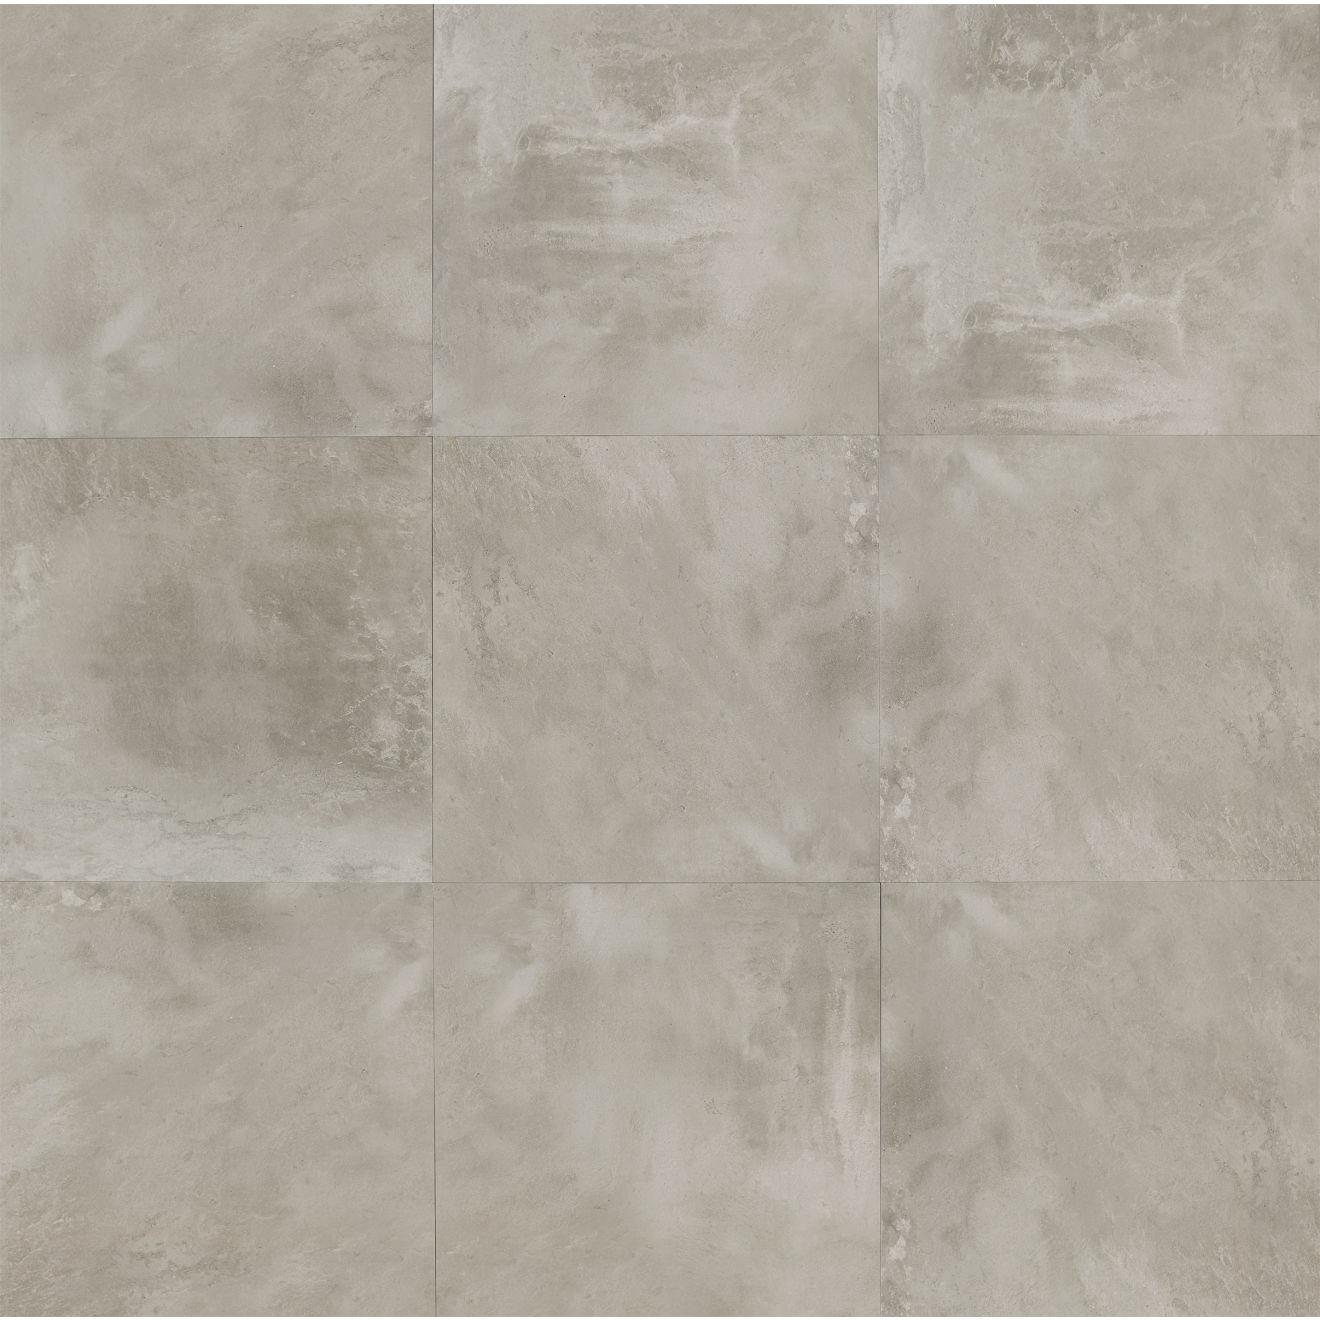 "Cemento 24"" x 24"" Floor & Wall Tile in Classico"